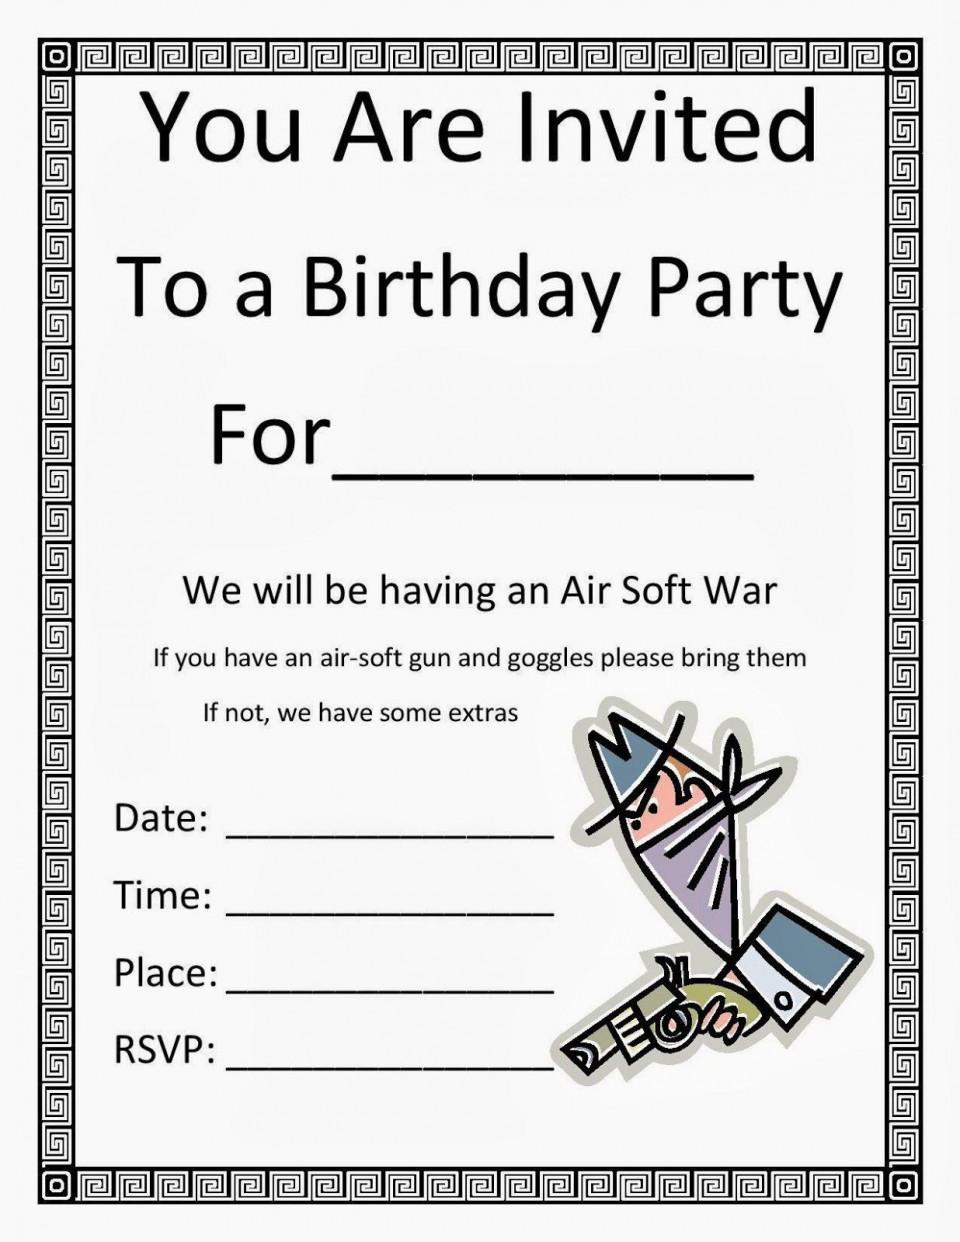 000 Marvelou Microsoft Word Birthday Invitation Template Sample  Editable 50th 60th960